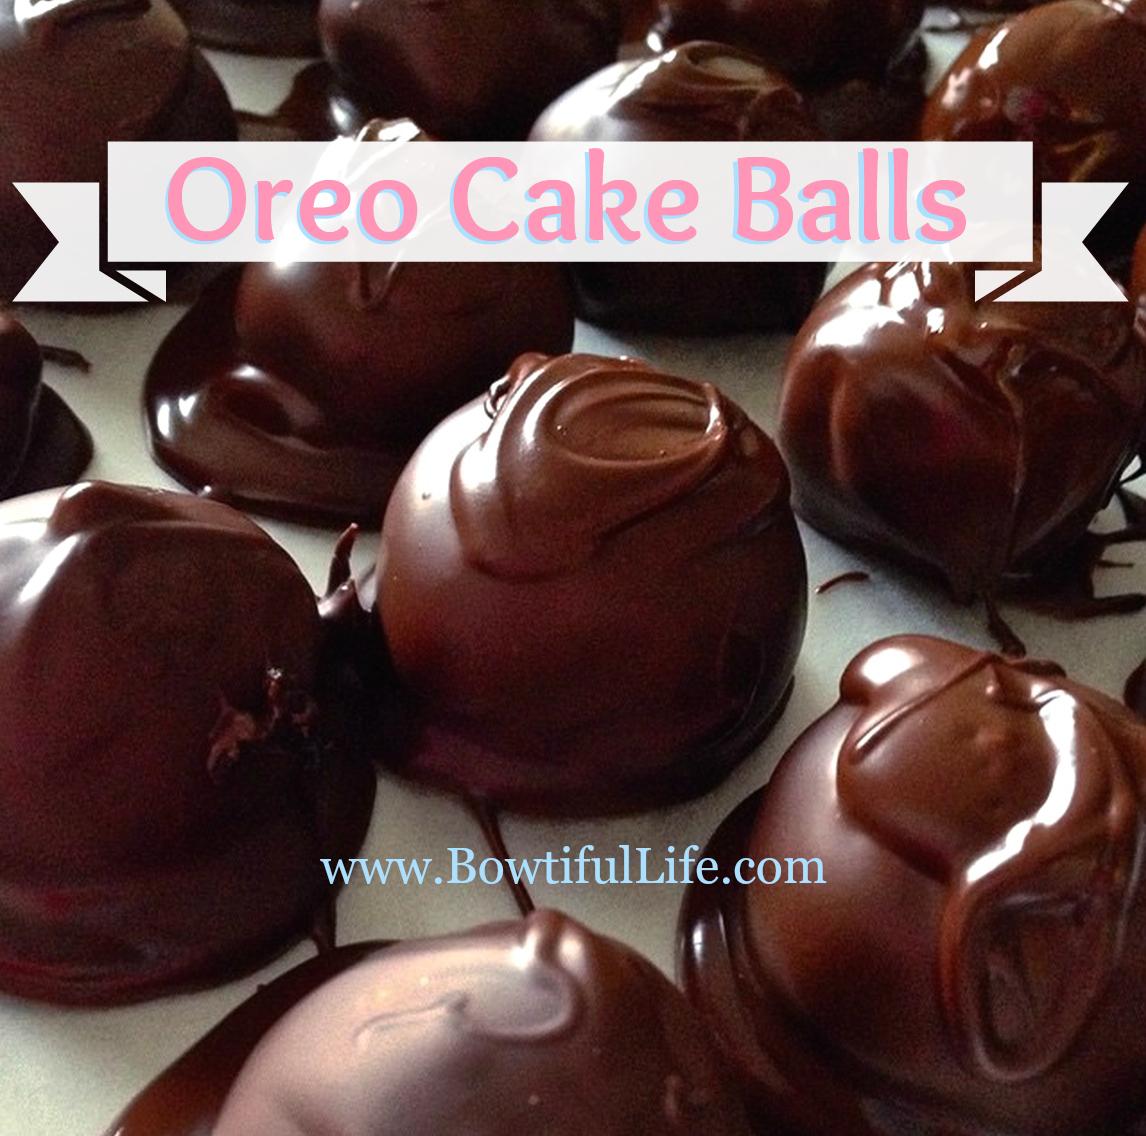 Oreo Cake Balls – No Baking Required